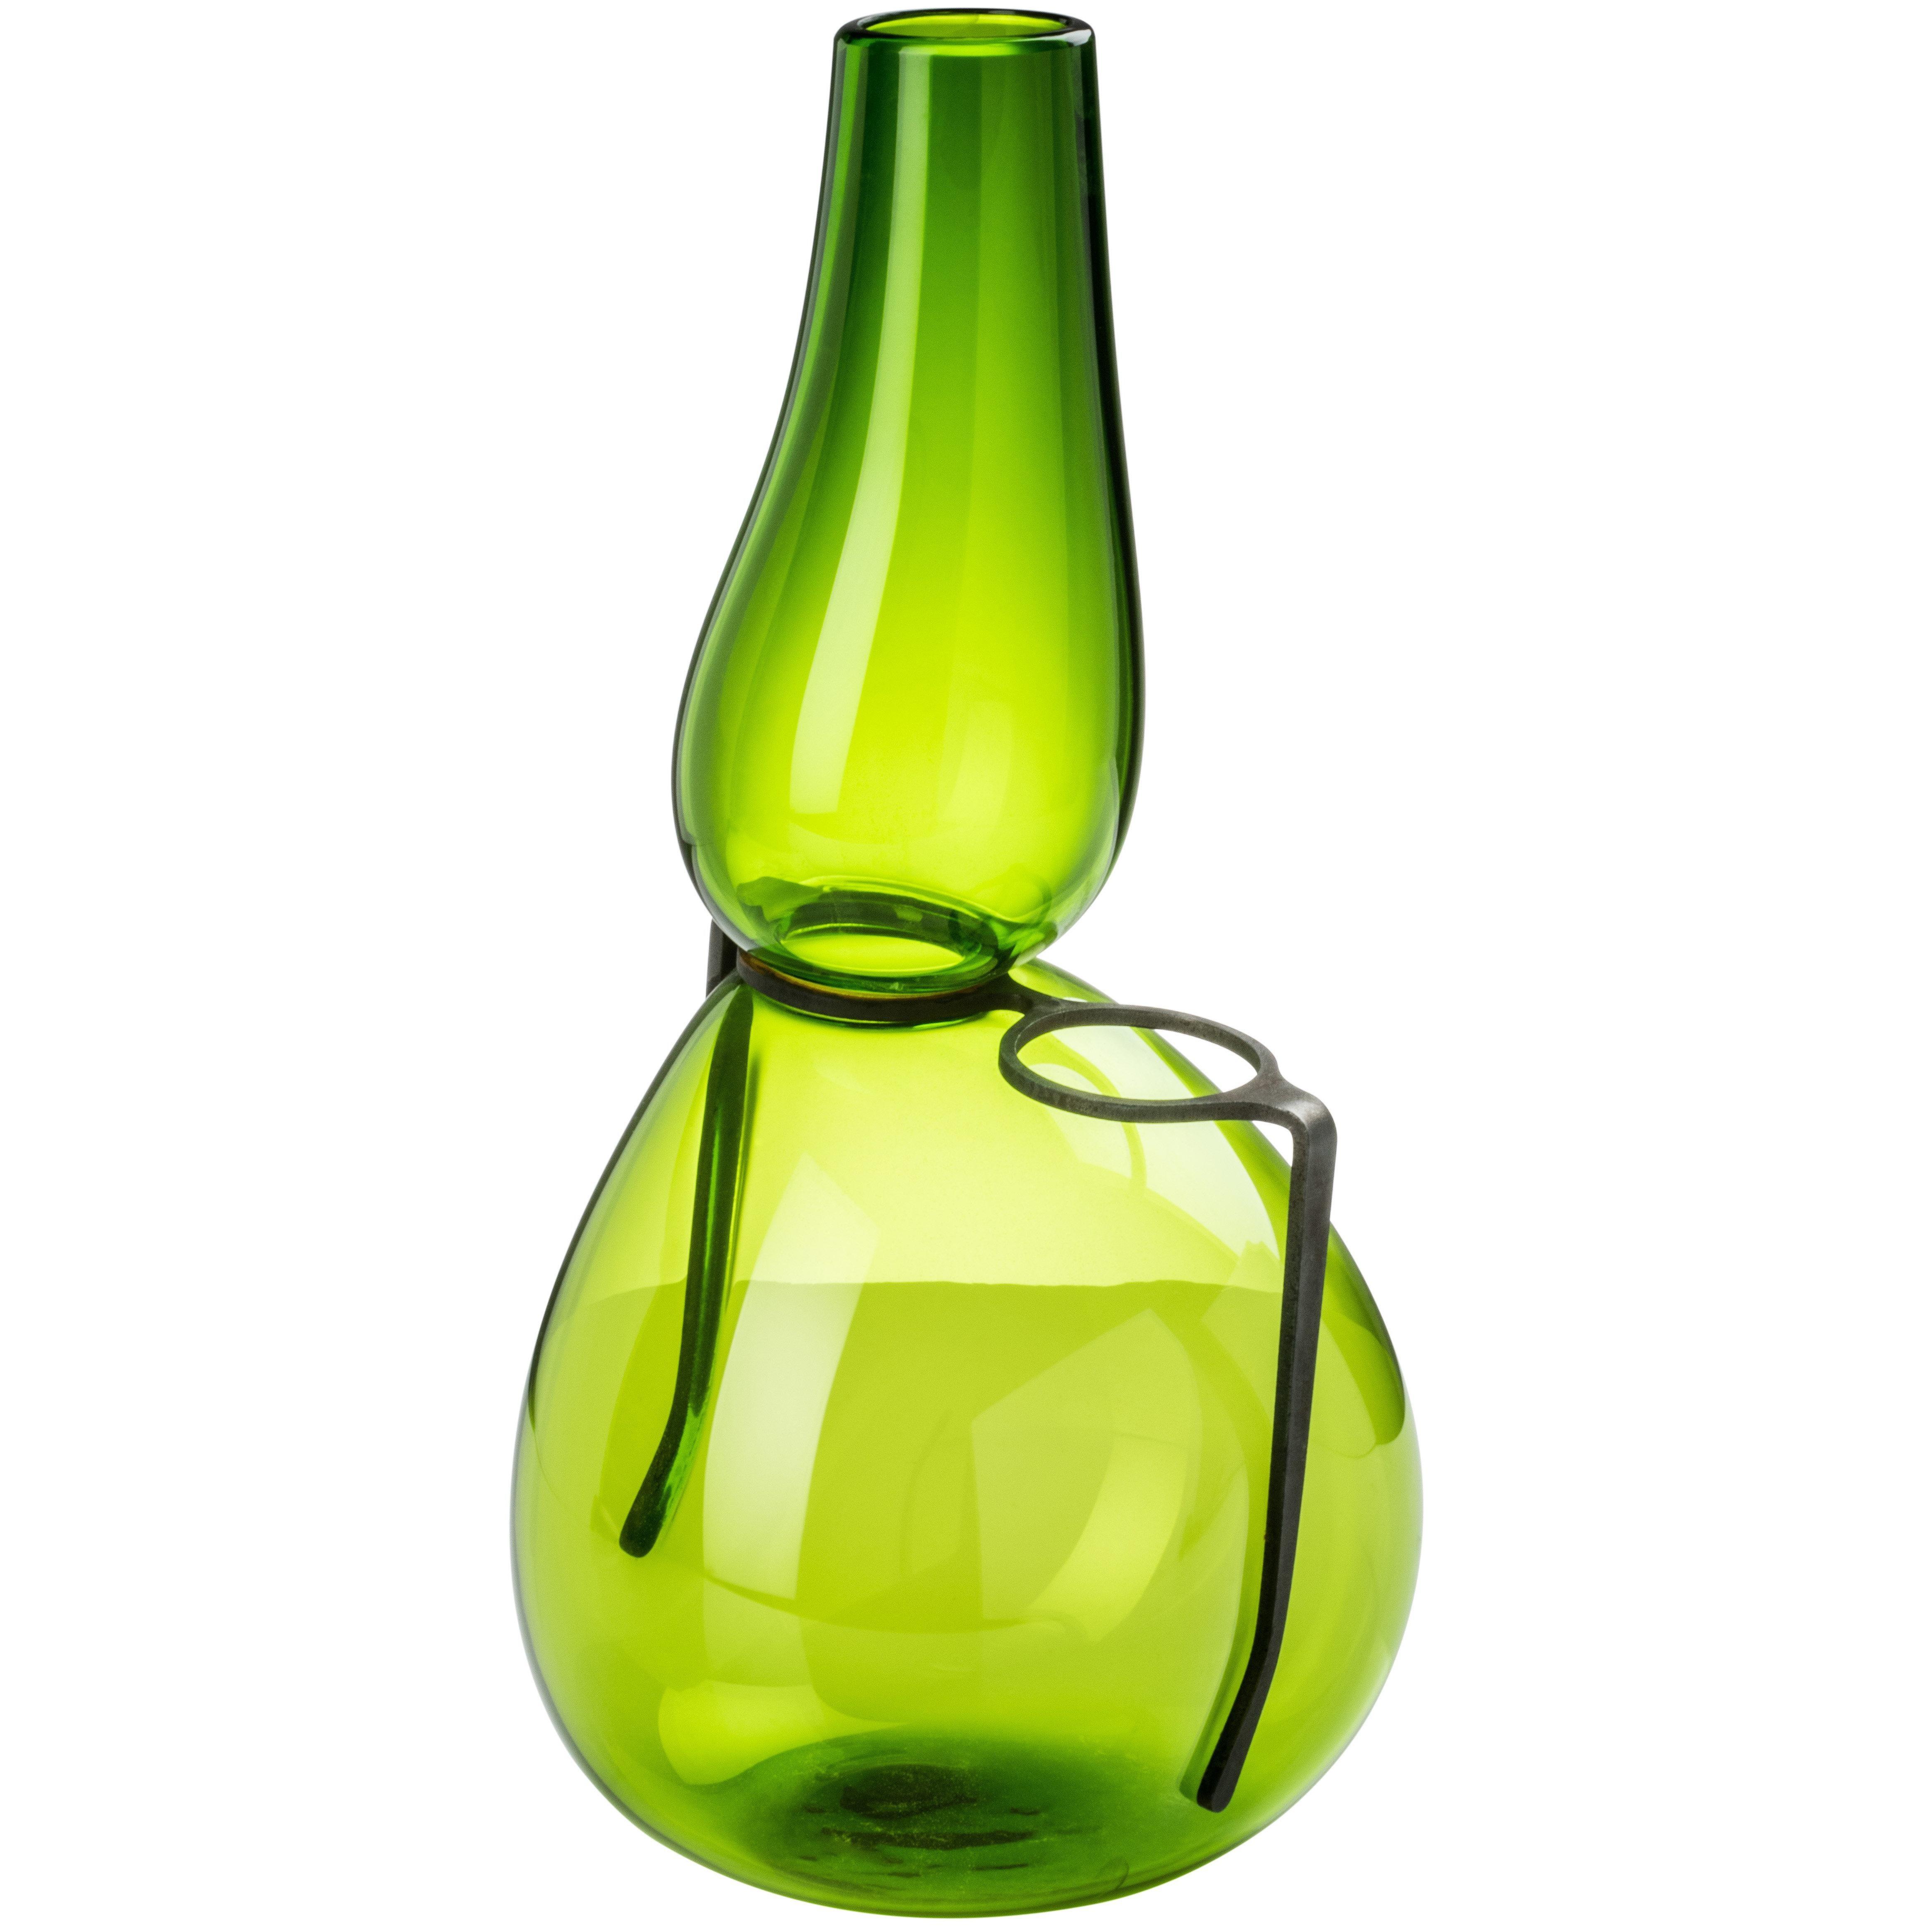 Venini 'Where Are My Glasses?' Single Lens Glass Vase in Green by Ron Arad